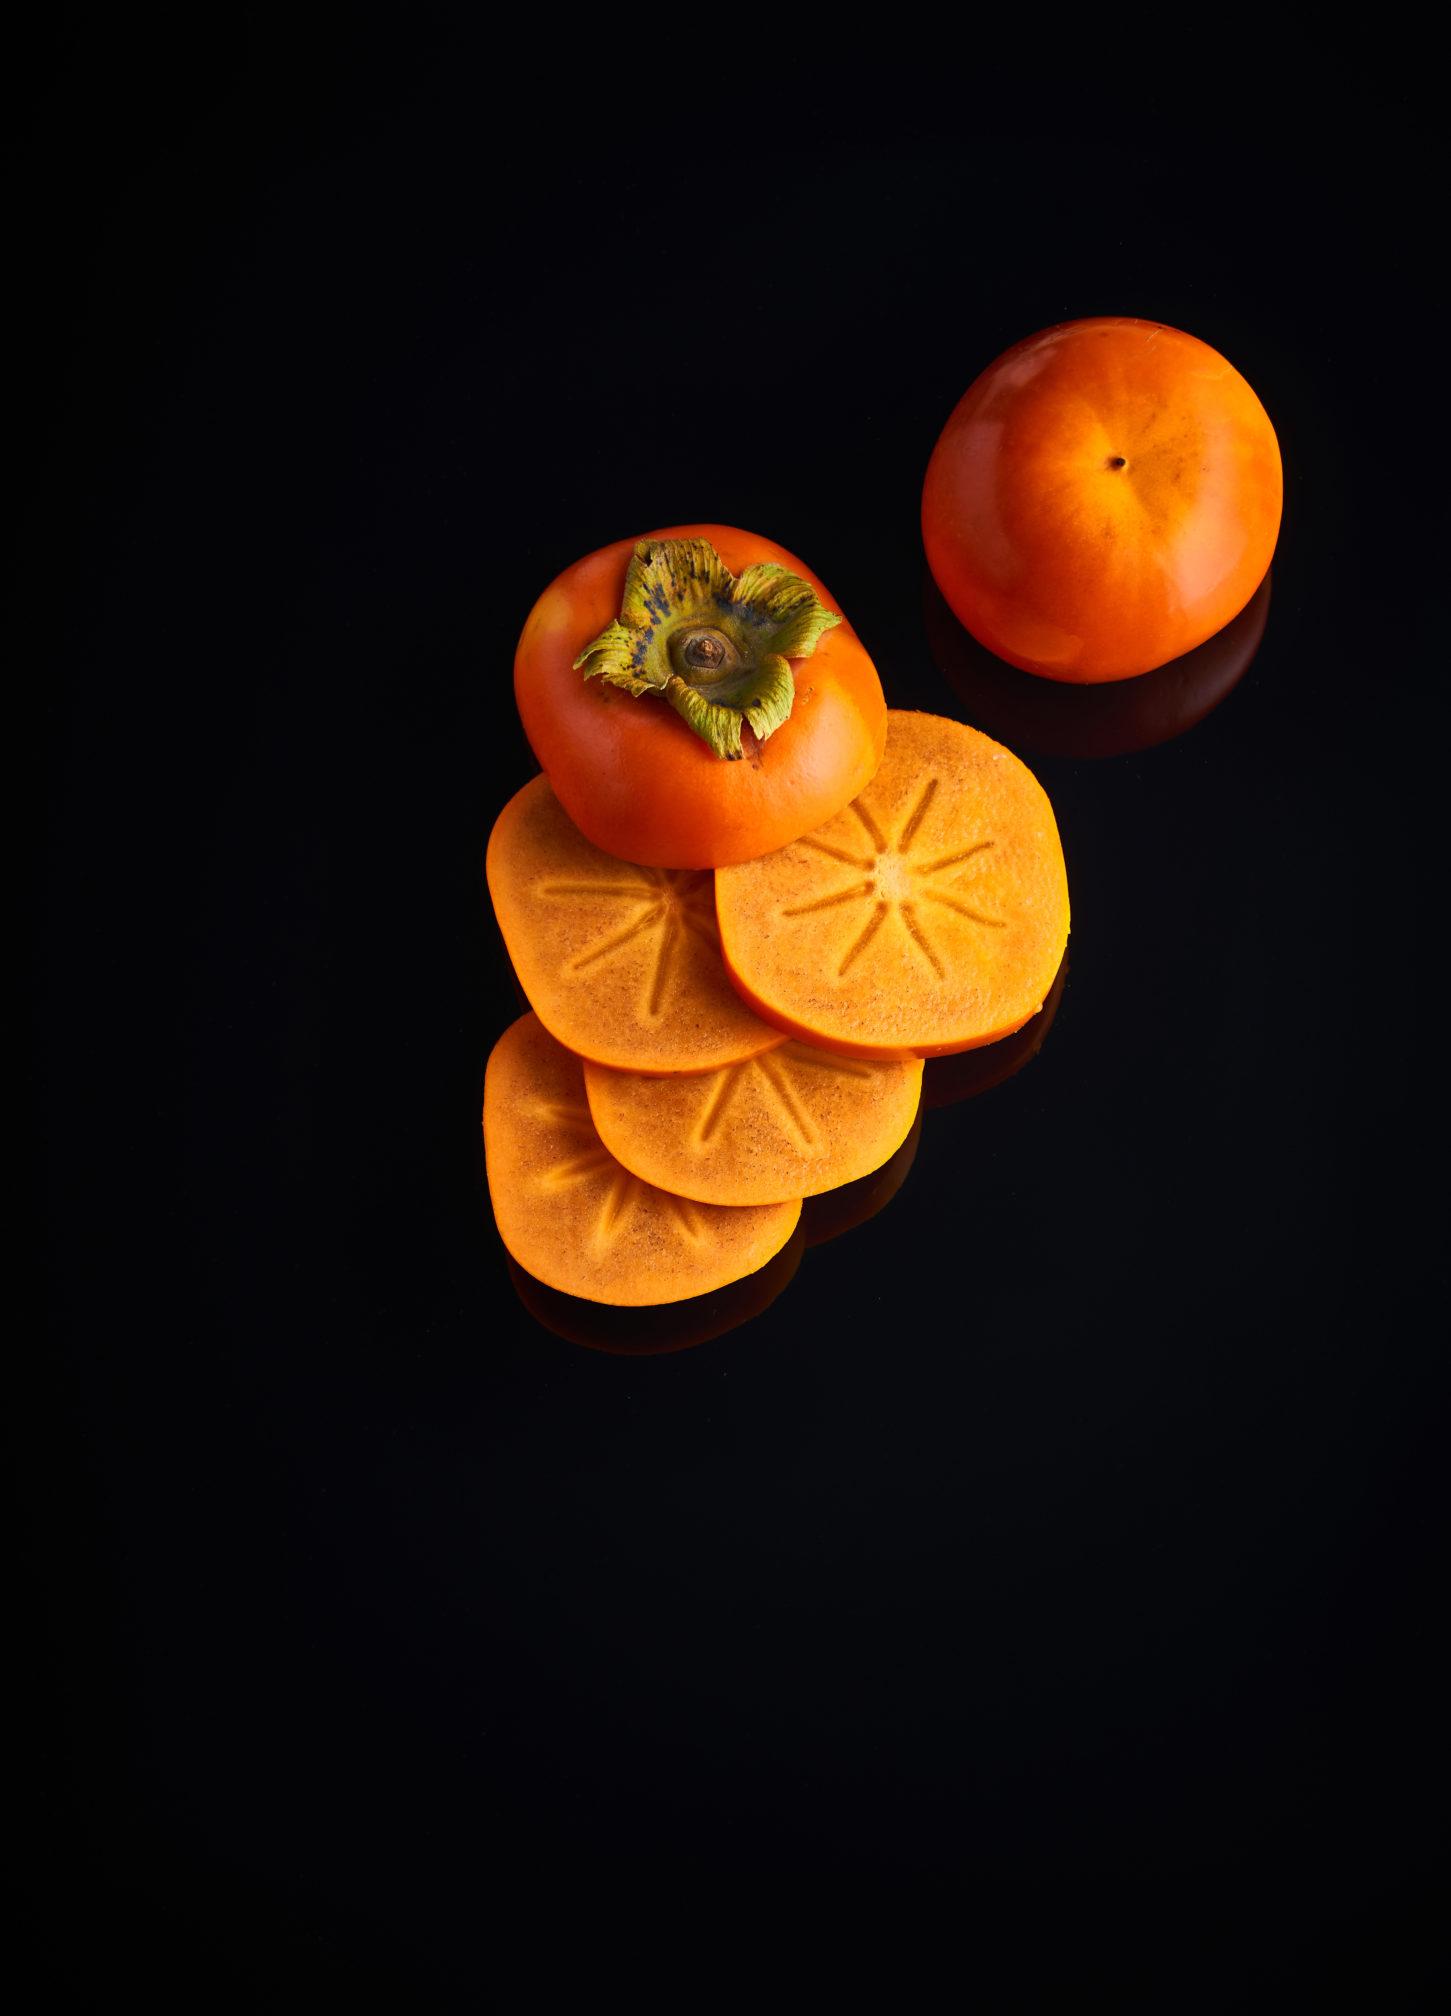 capexo-lilot-fruits-exotique-sharon-espagne-israel